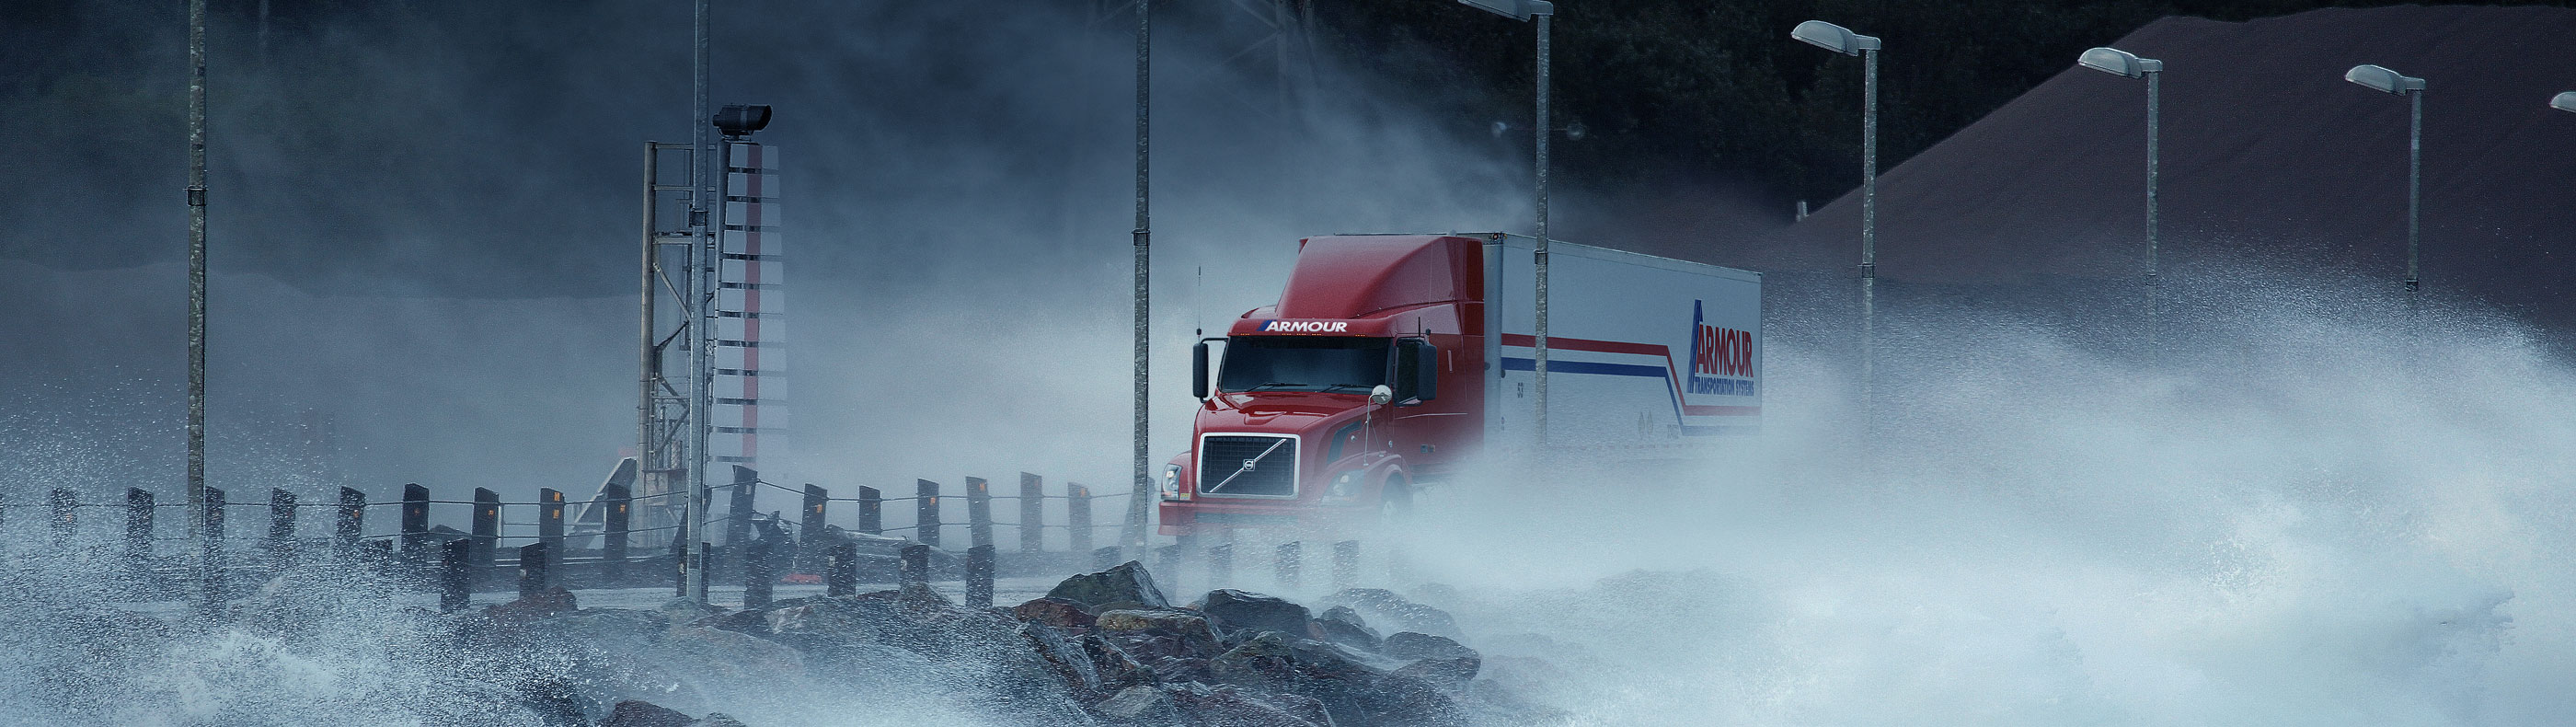 Armour Transportation truck